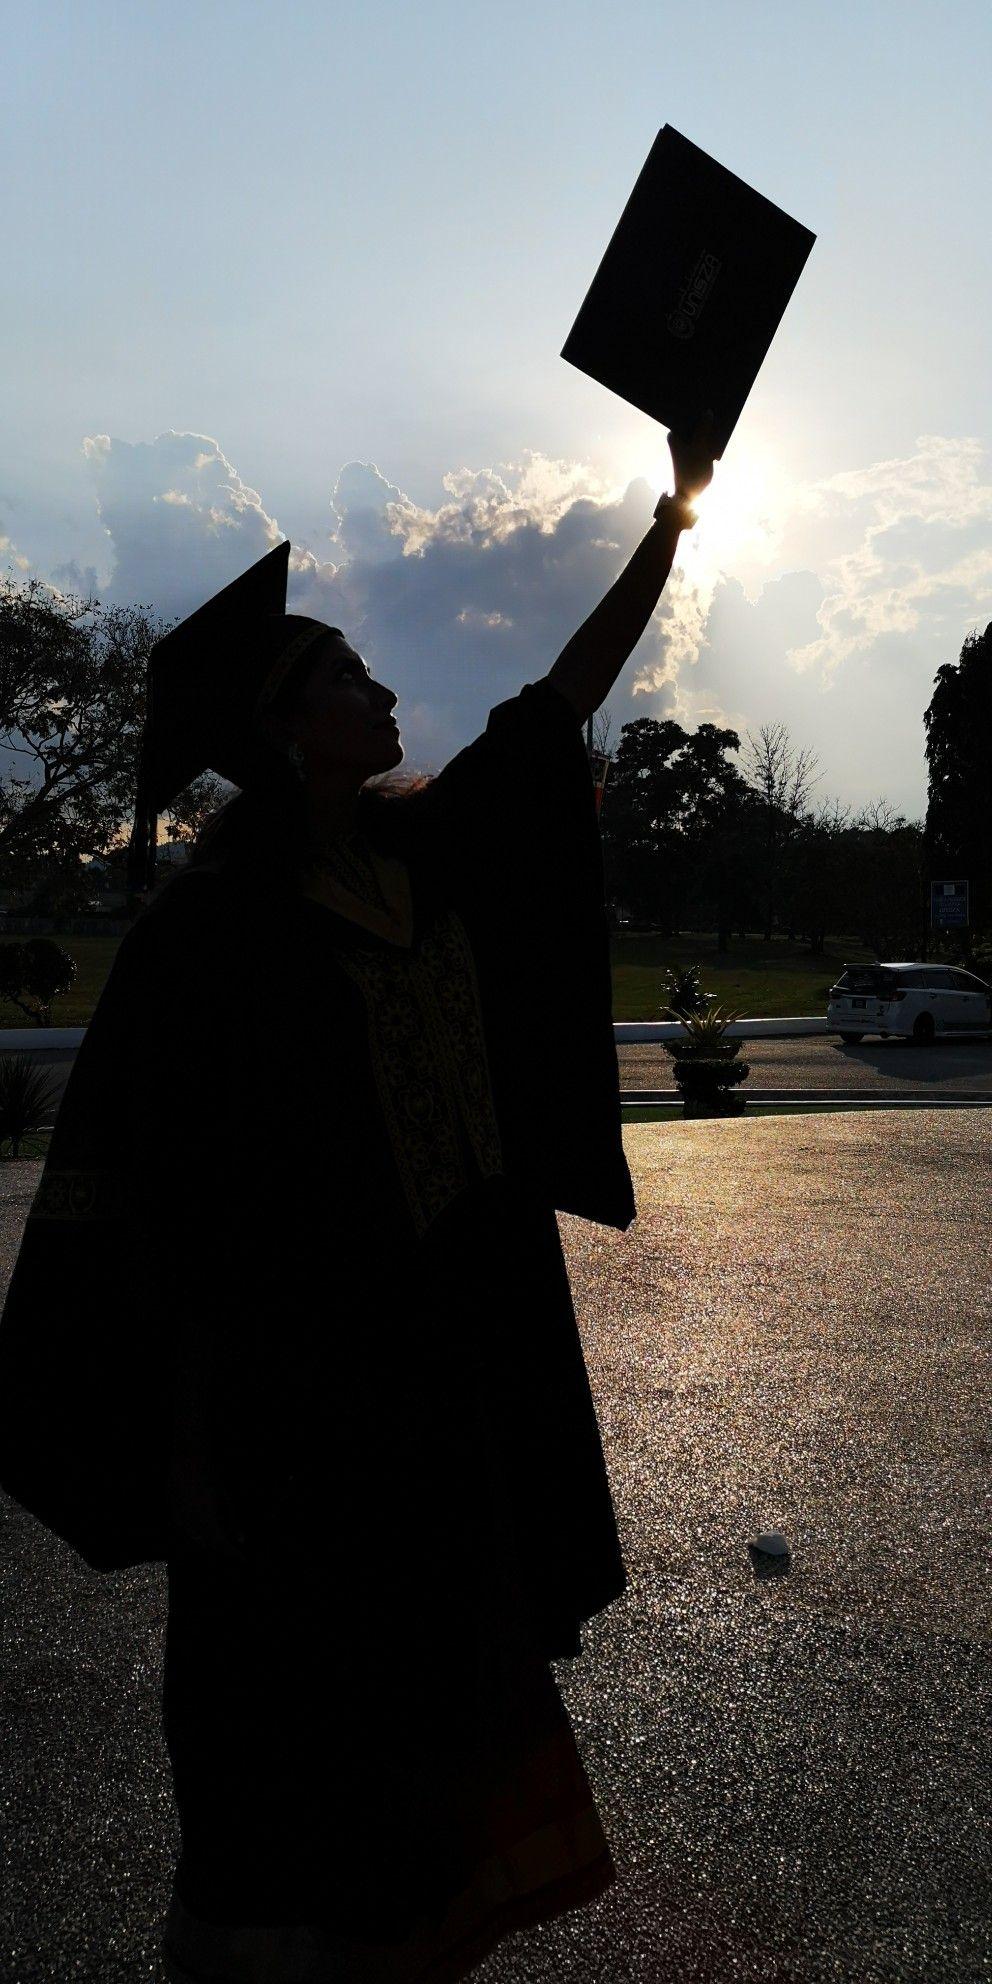 Pin By Tinagaren Ramkumar On V I P Girl Graduation Pictures Graduation Picture Poses Graduation Photography